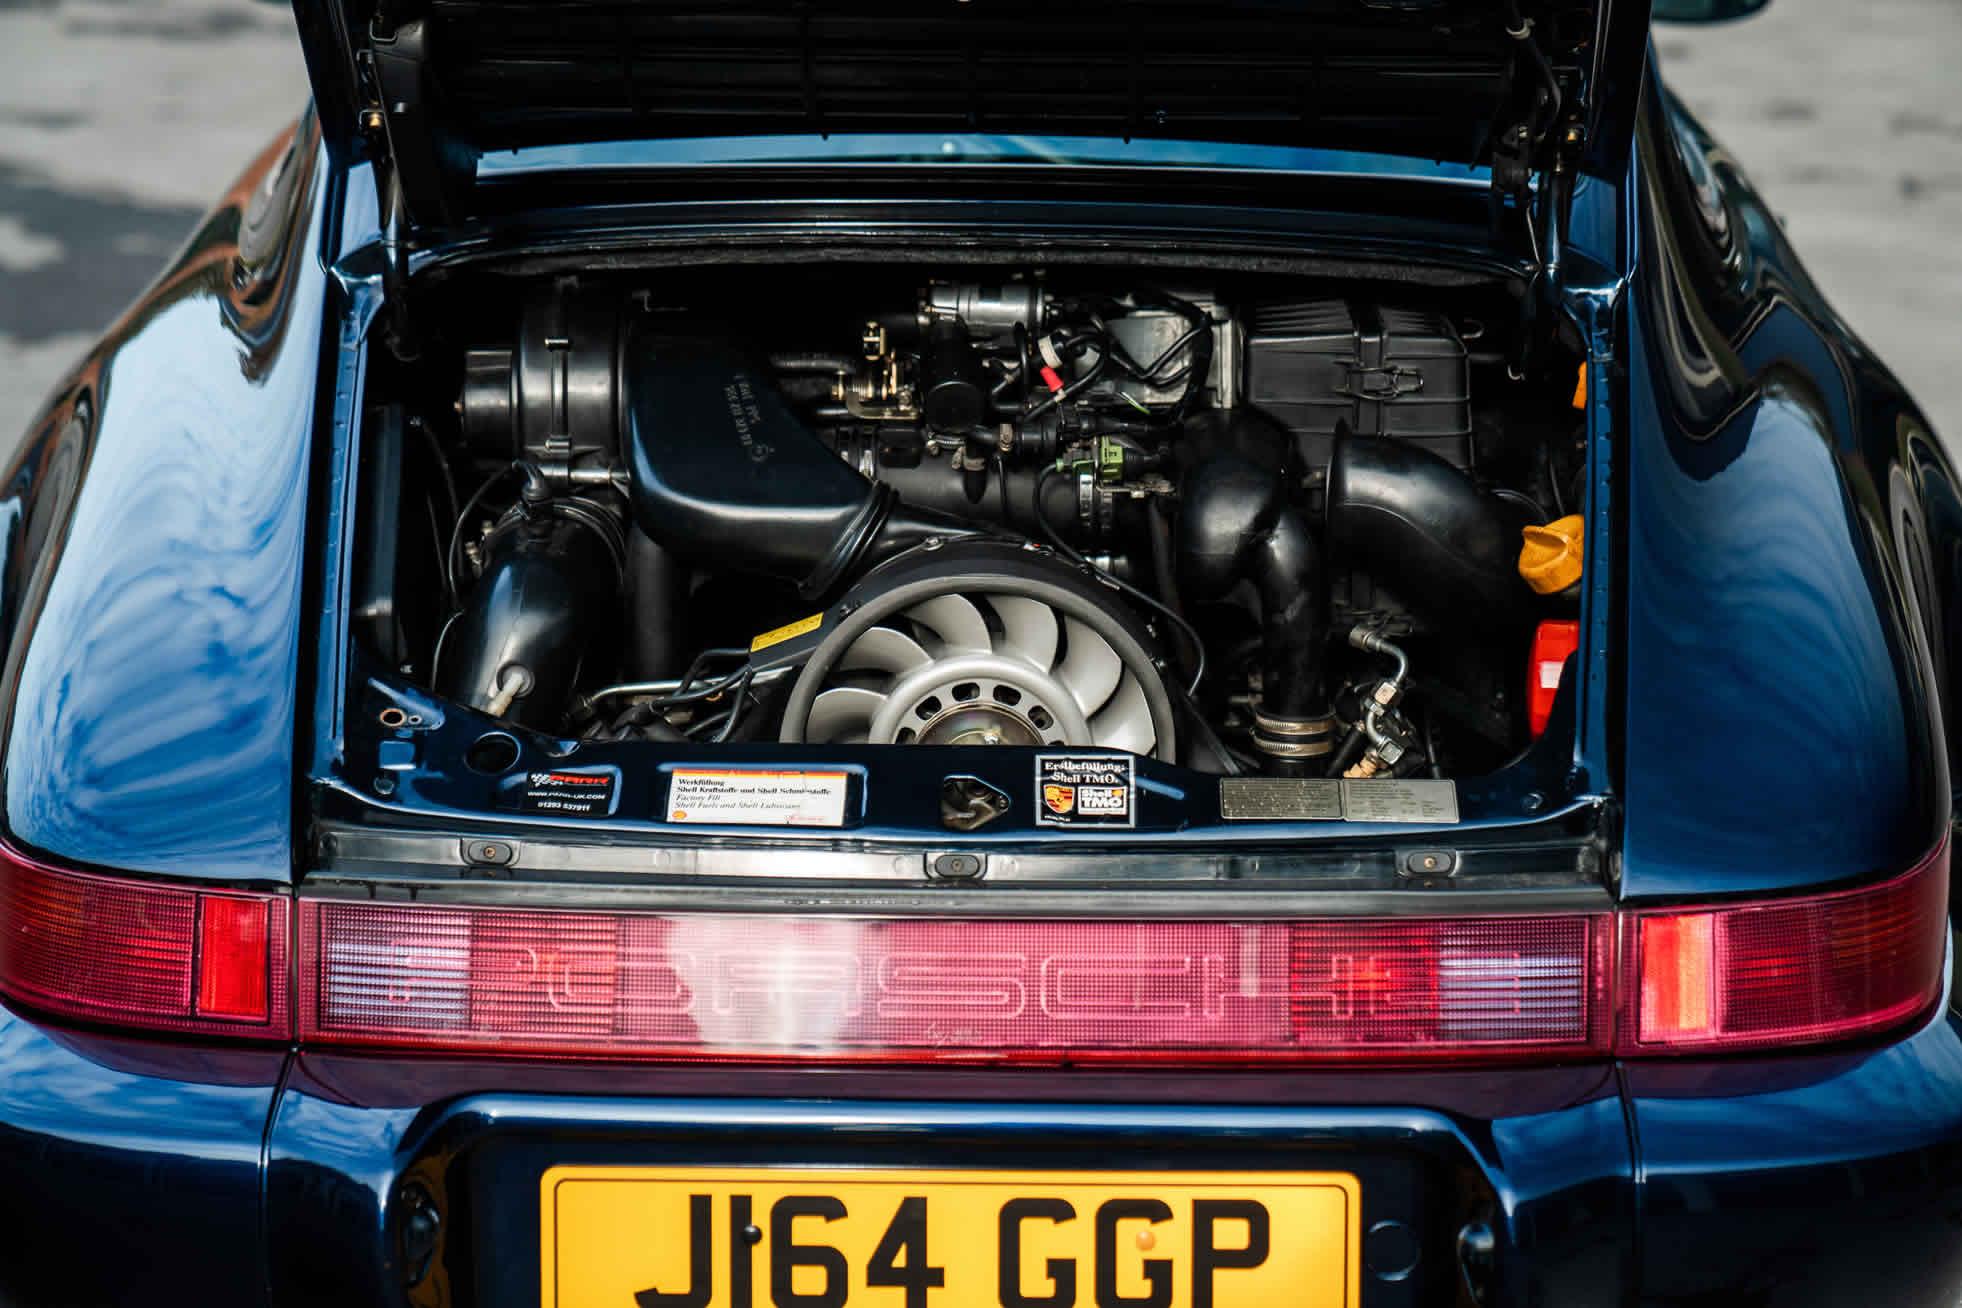 1991 Porsche Carrera 964 RS